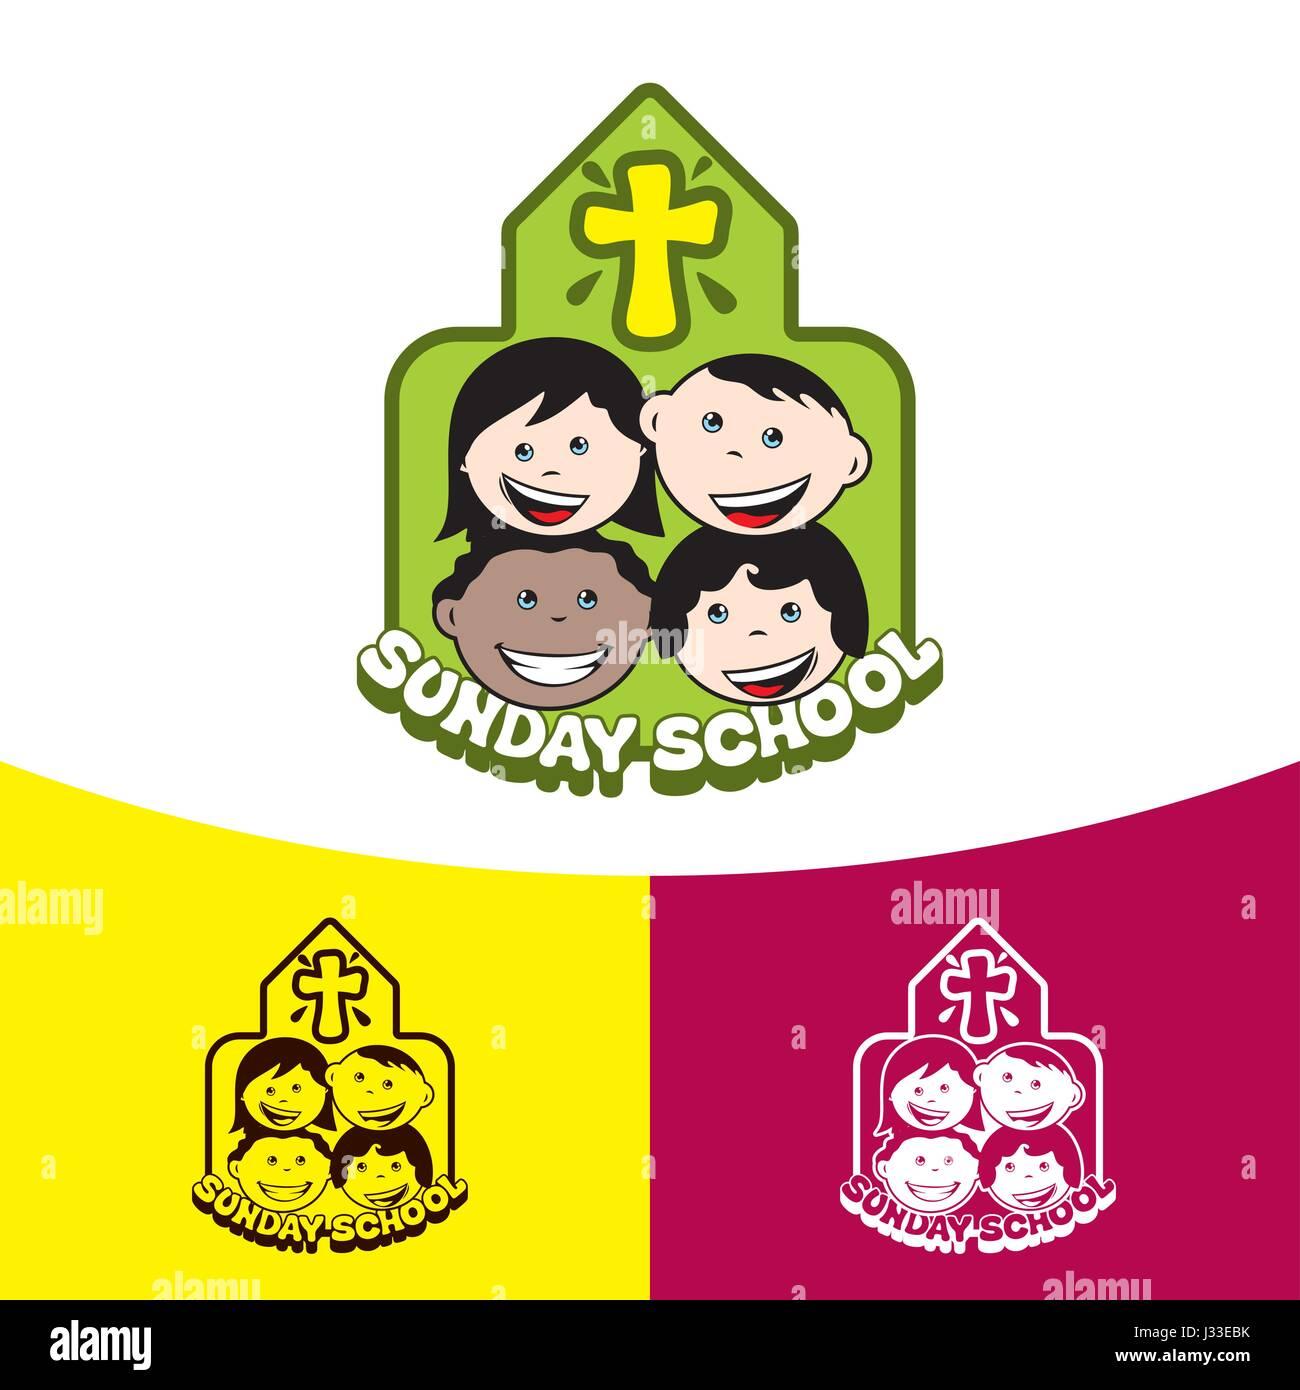 Logo sunday school christian symbols the church of jesus christ logo sunday school christian symbols the church of jesus christ buycottarizona Image collections